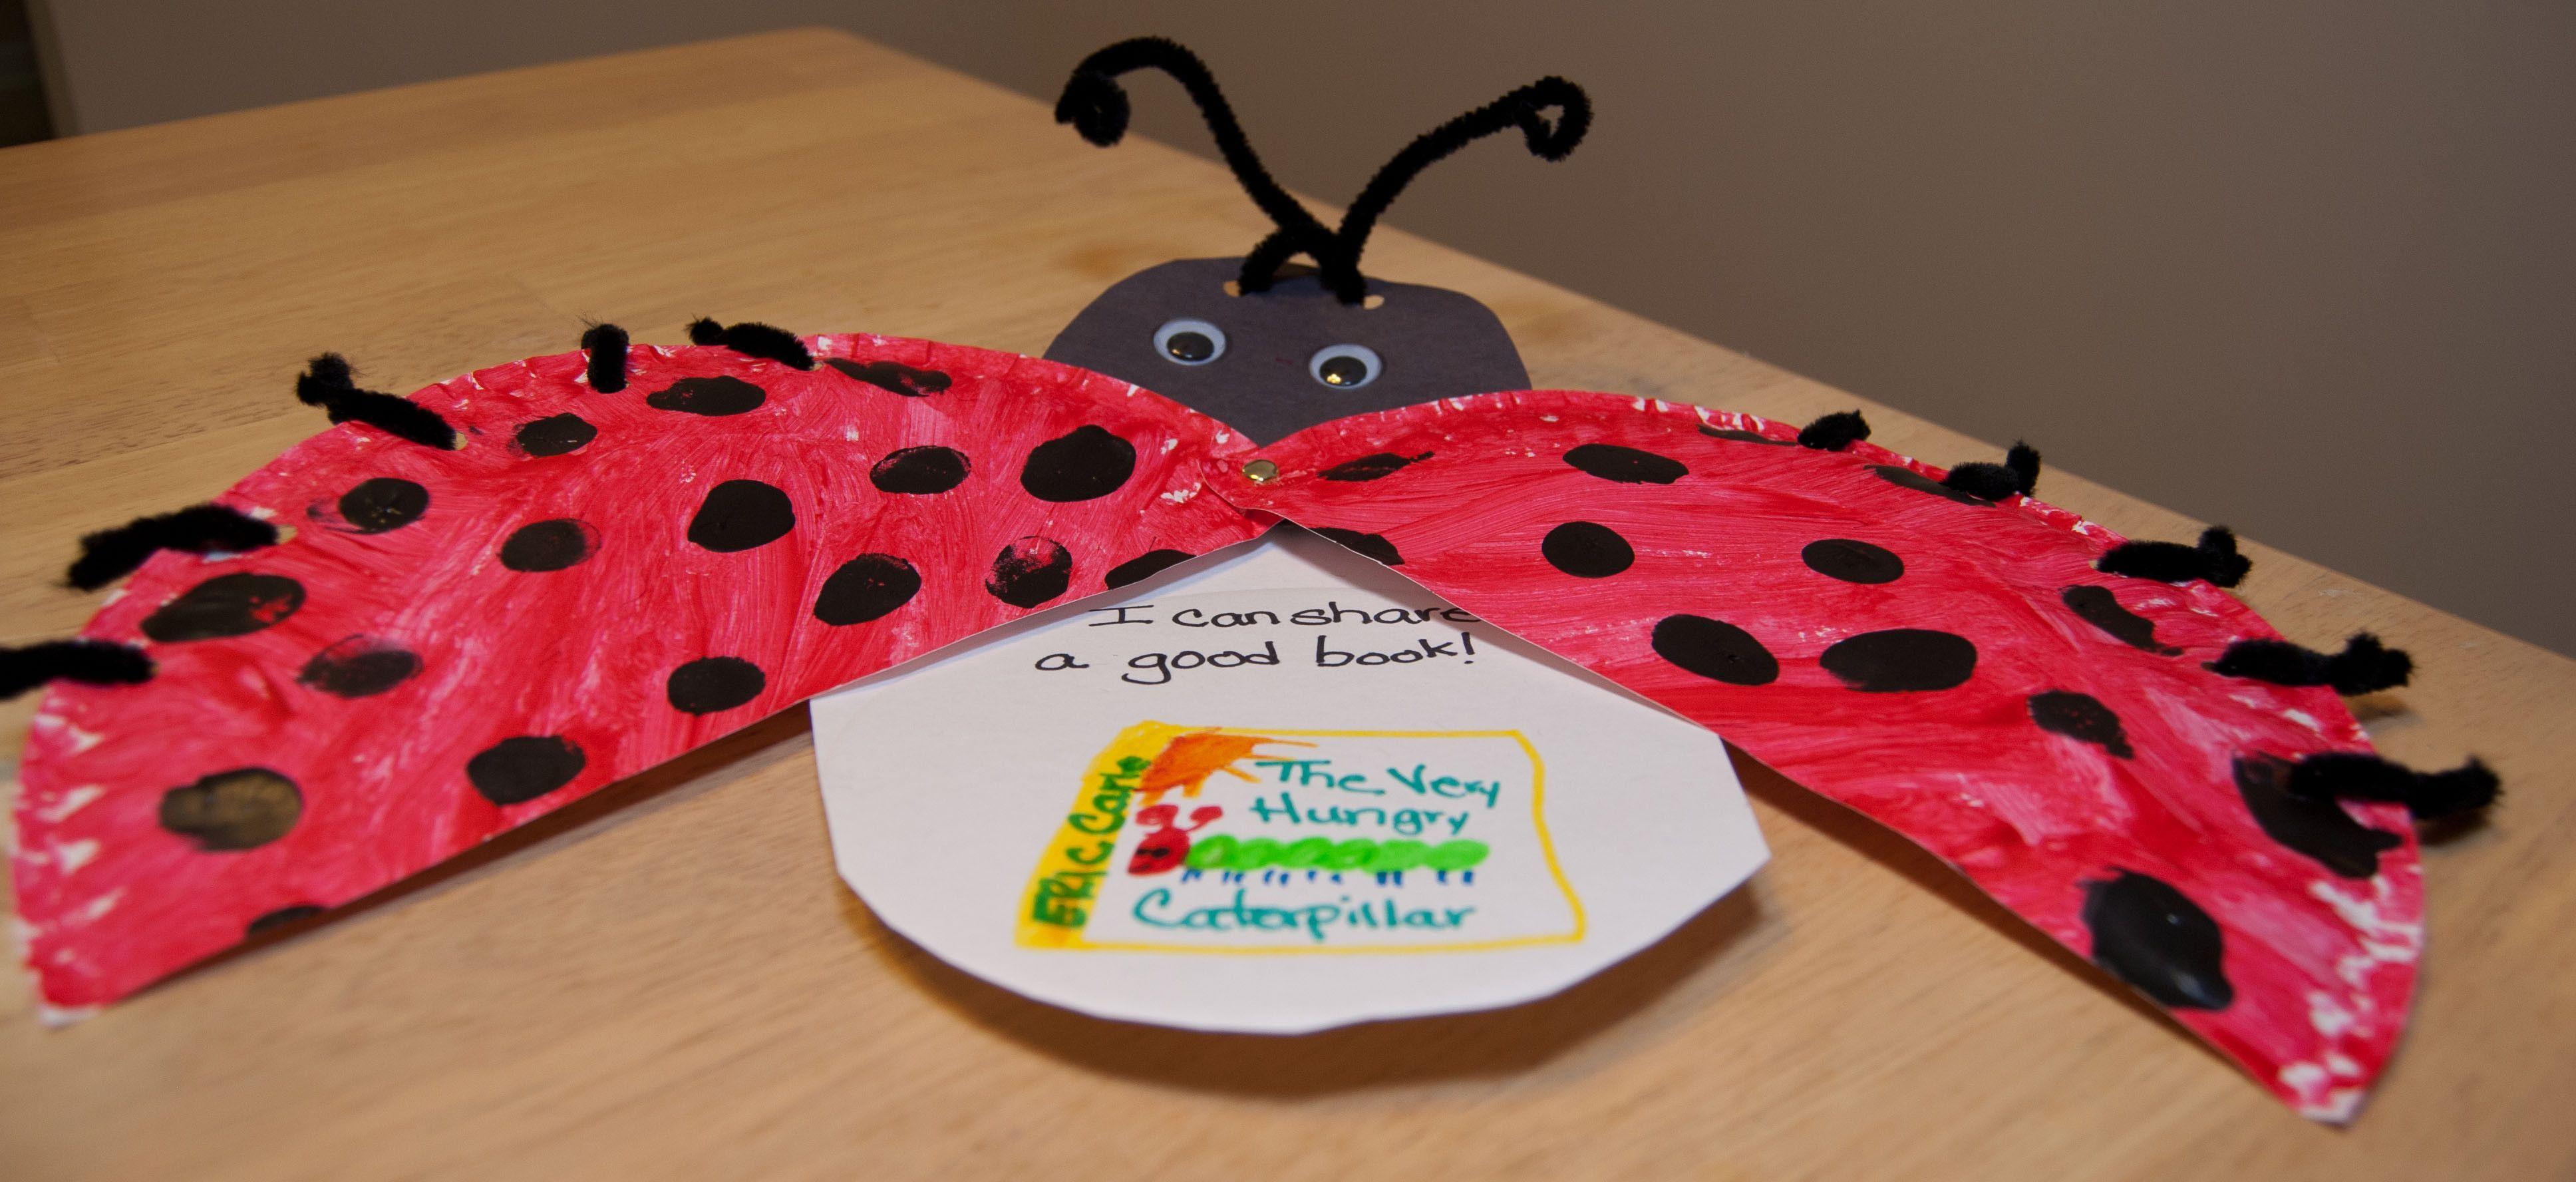 The Very Grouchy Ladybug Activities